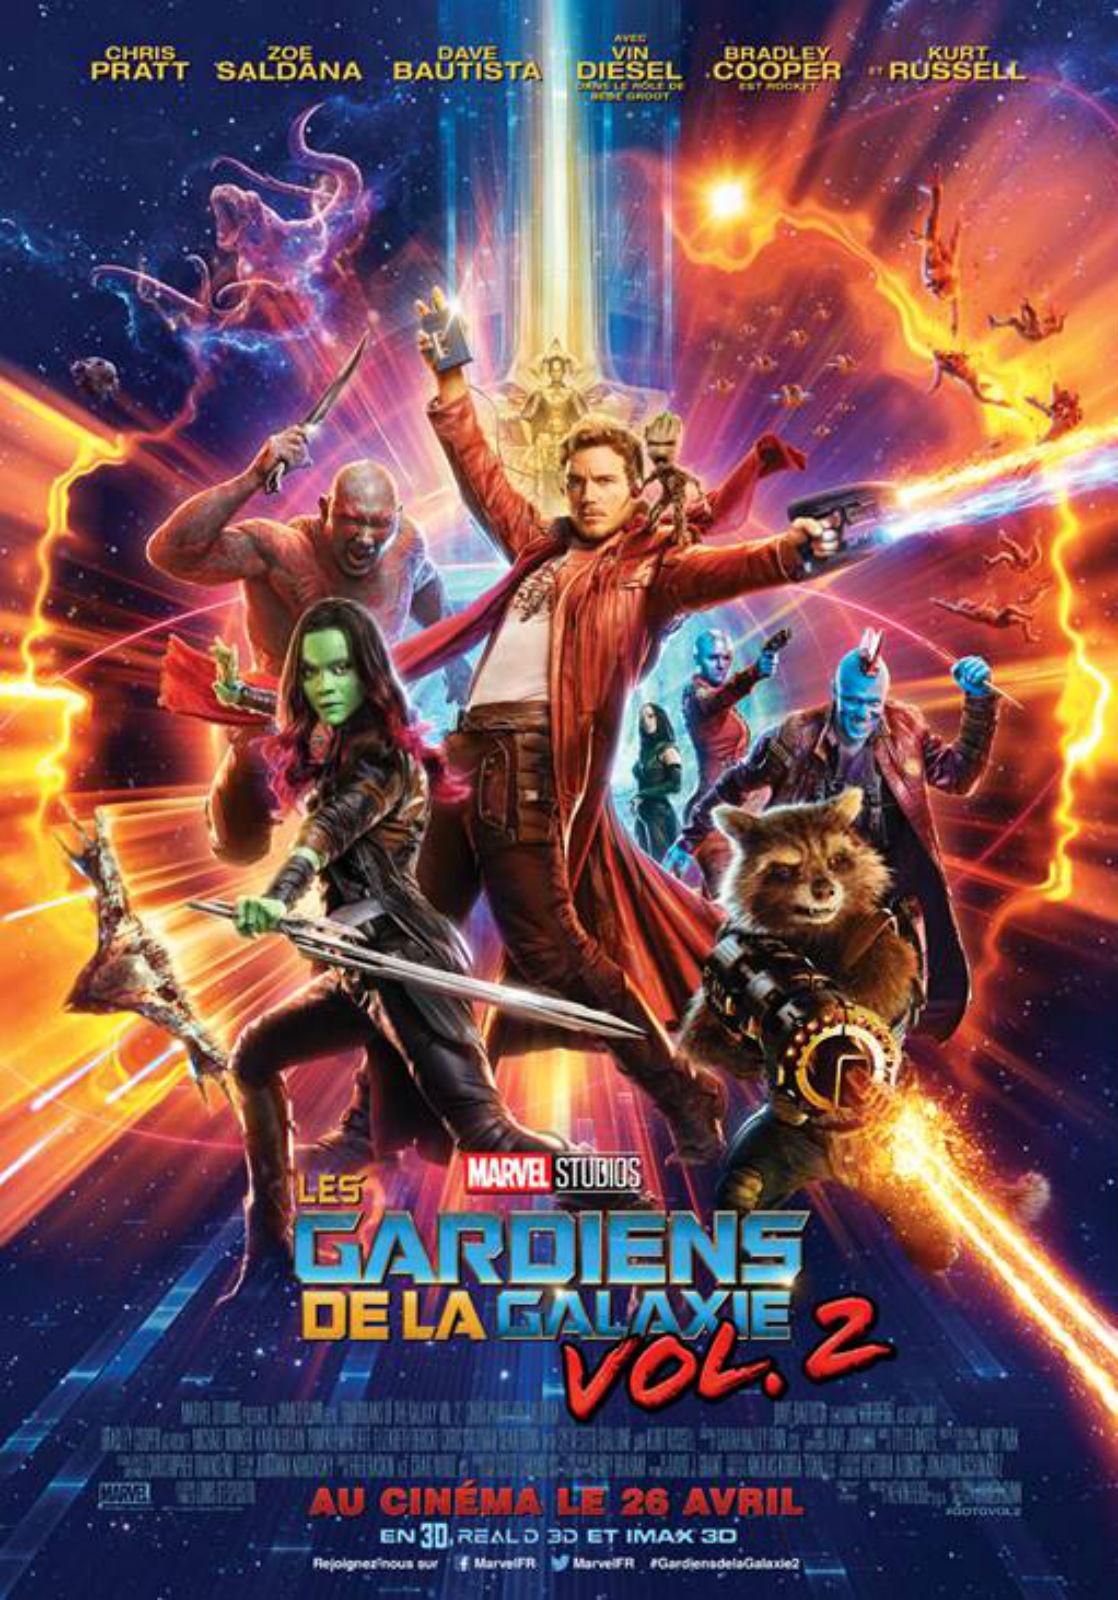 Les Gardiens de la Galaxie 2 - film 2017 - AlloCiné